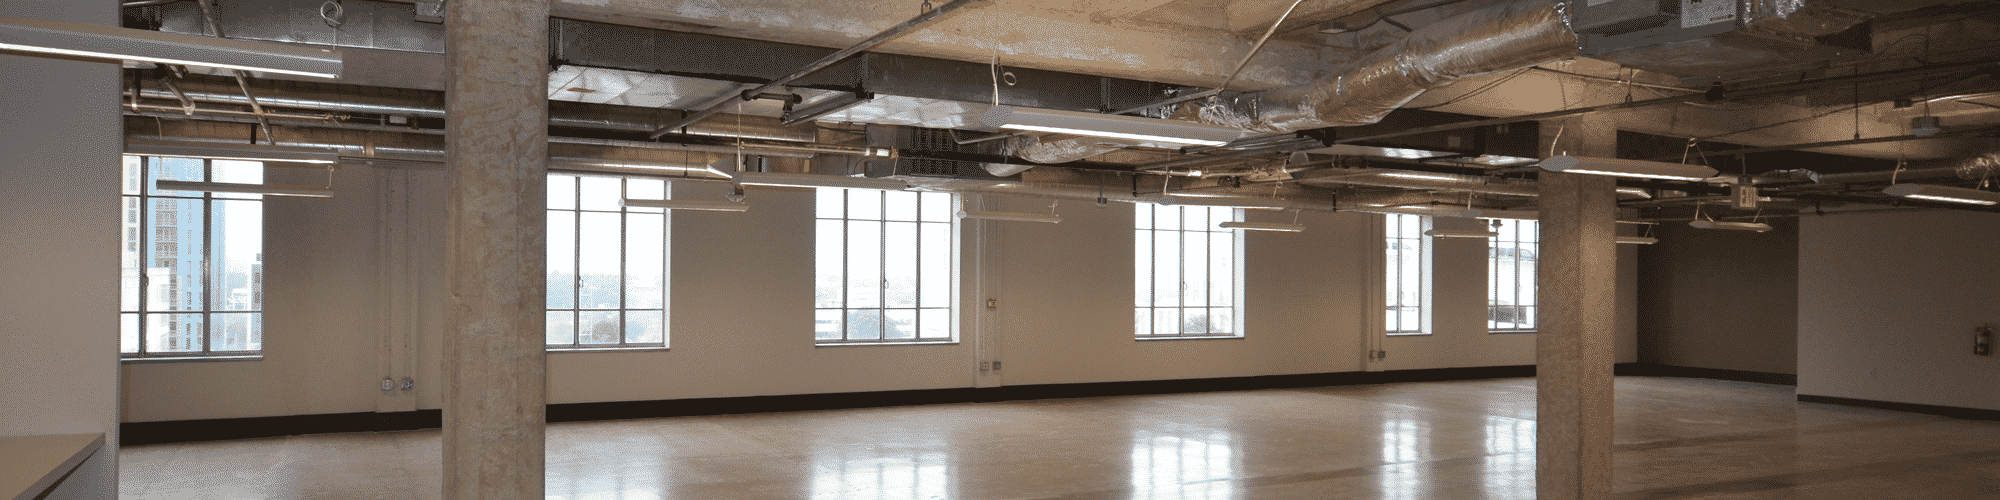 Travis Building Interior